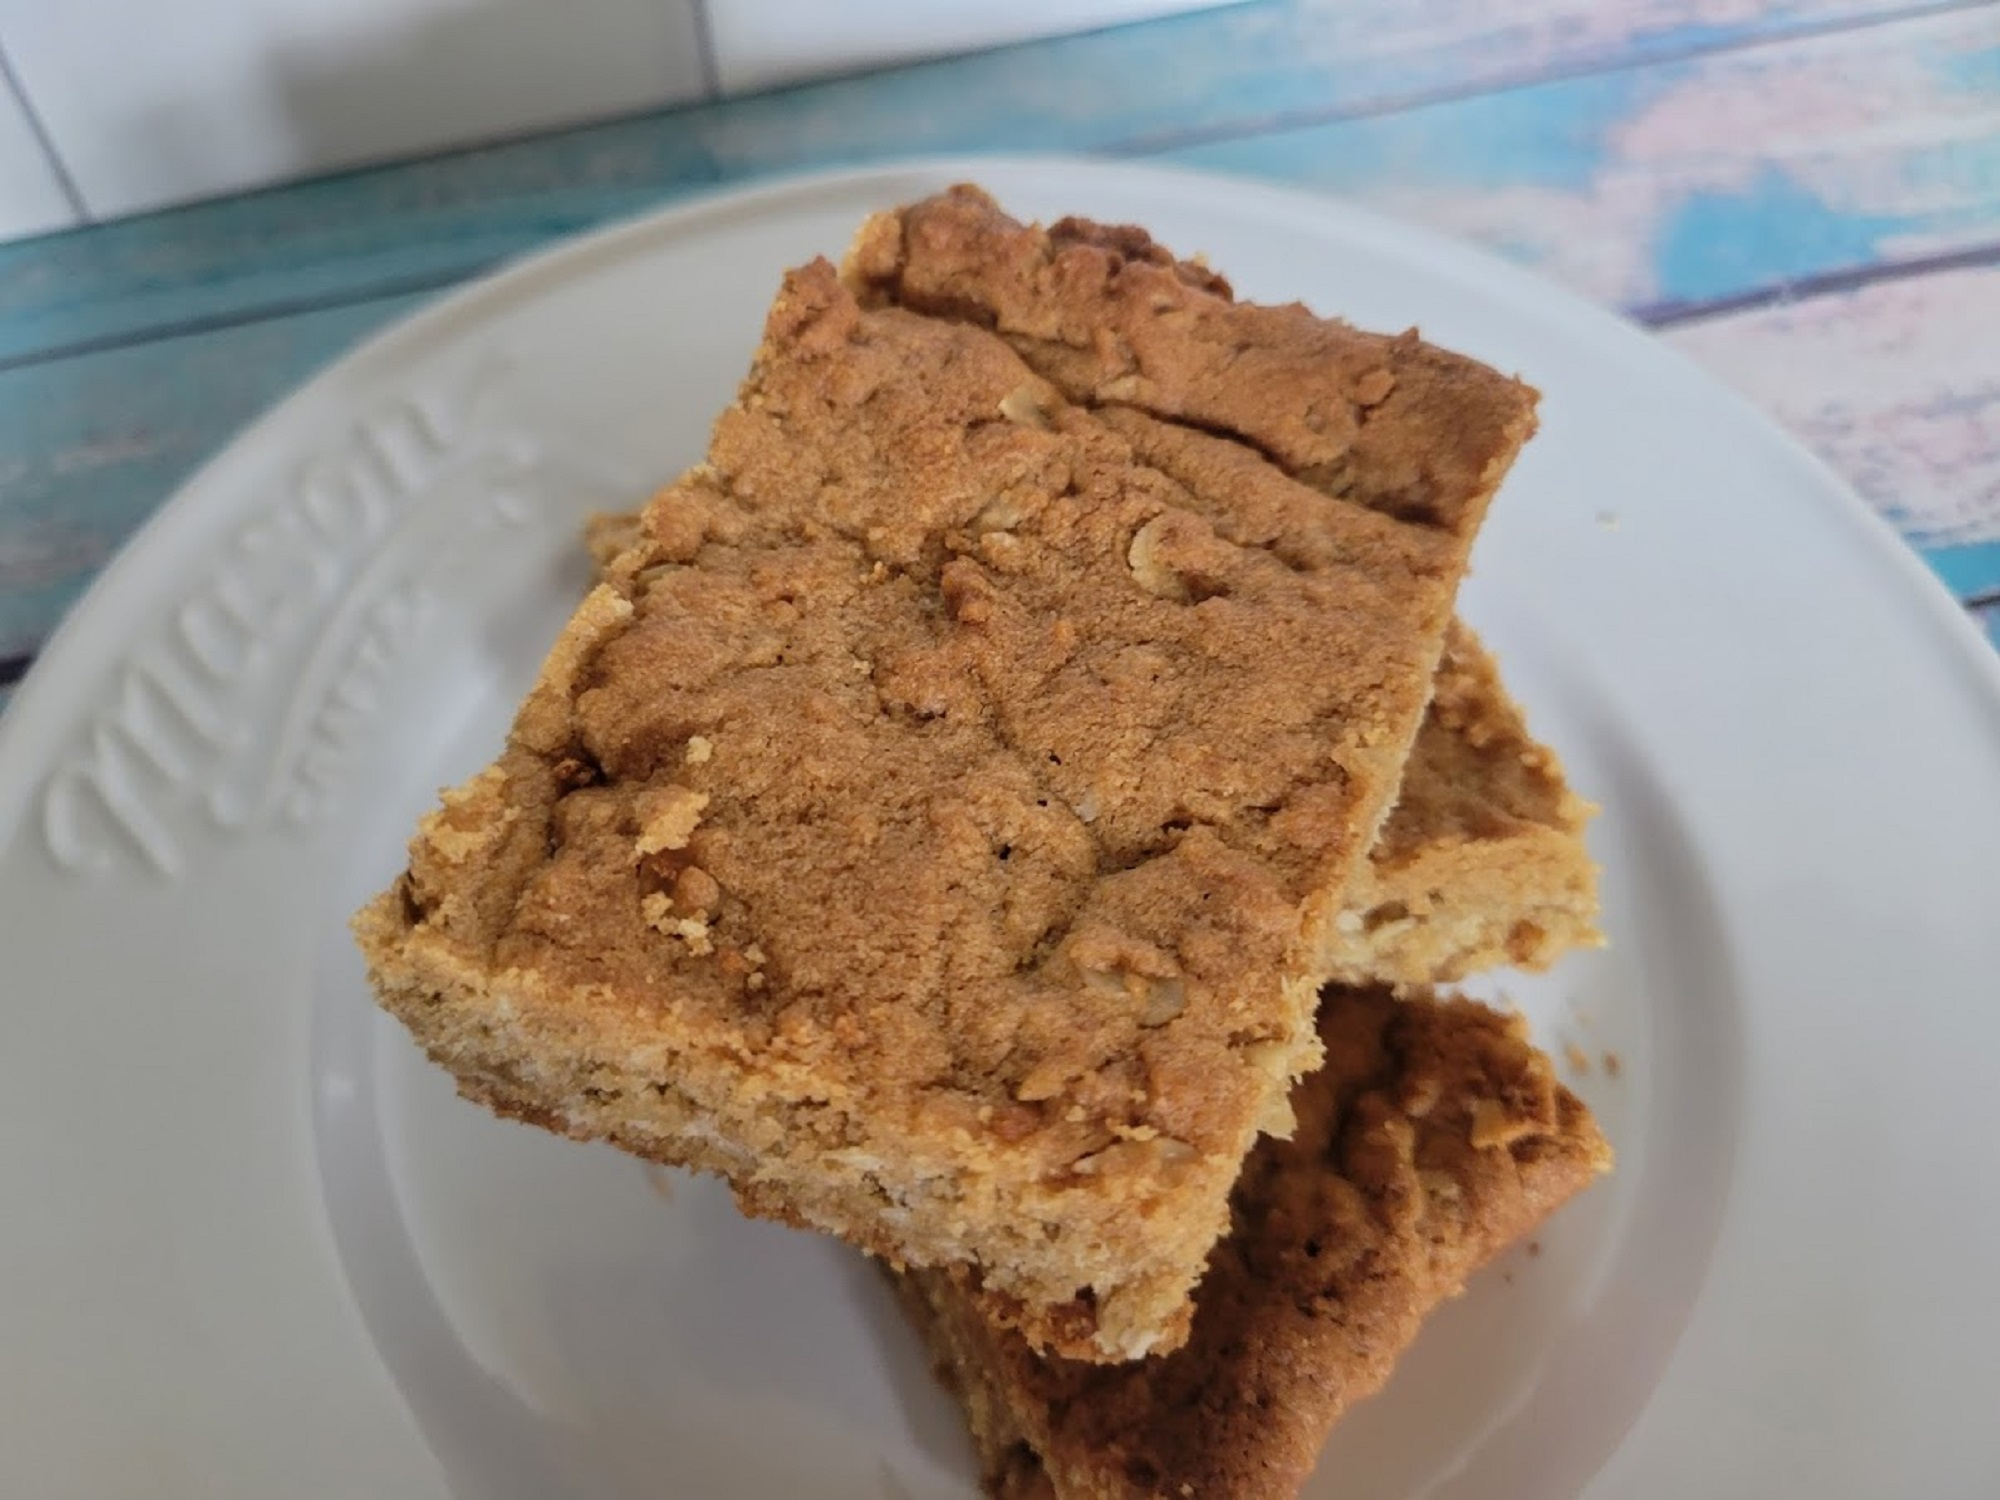 Retro School Cafeteria Peanut Butter Bars Rebekah Rose Hills